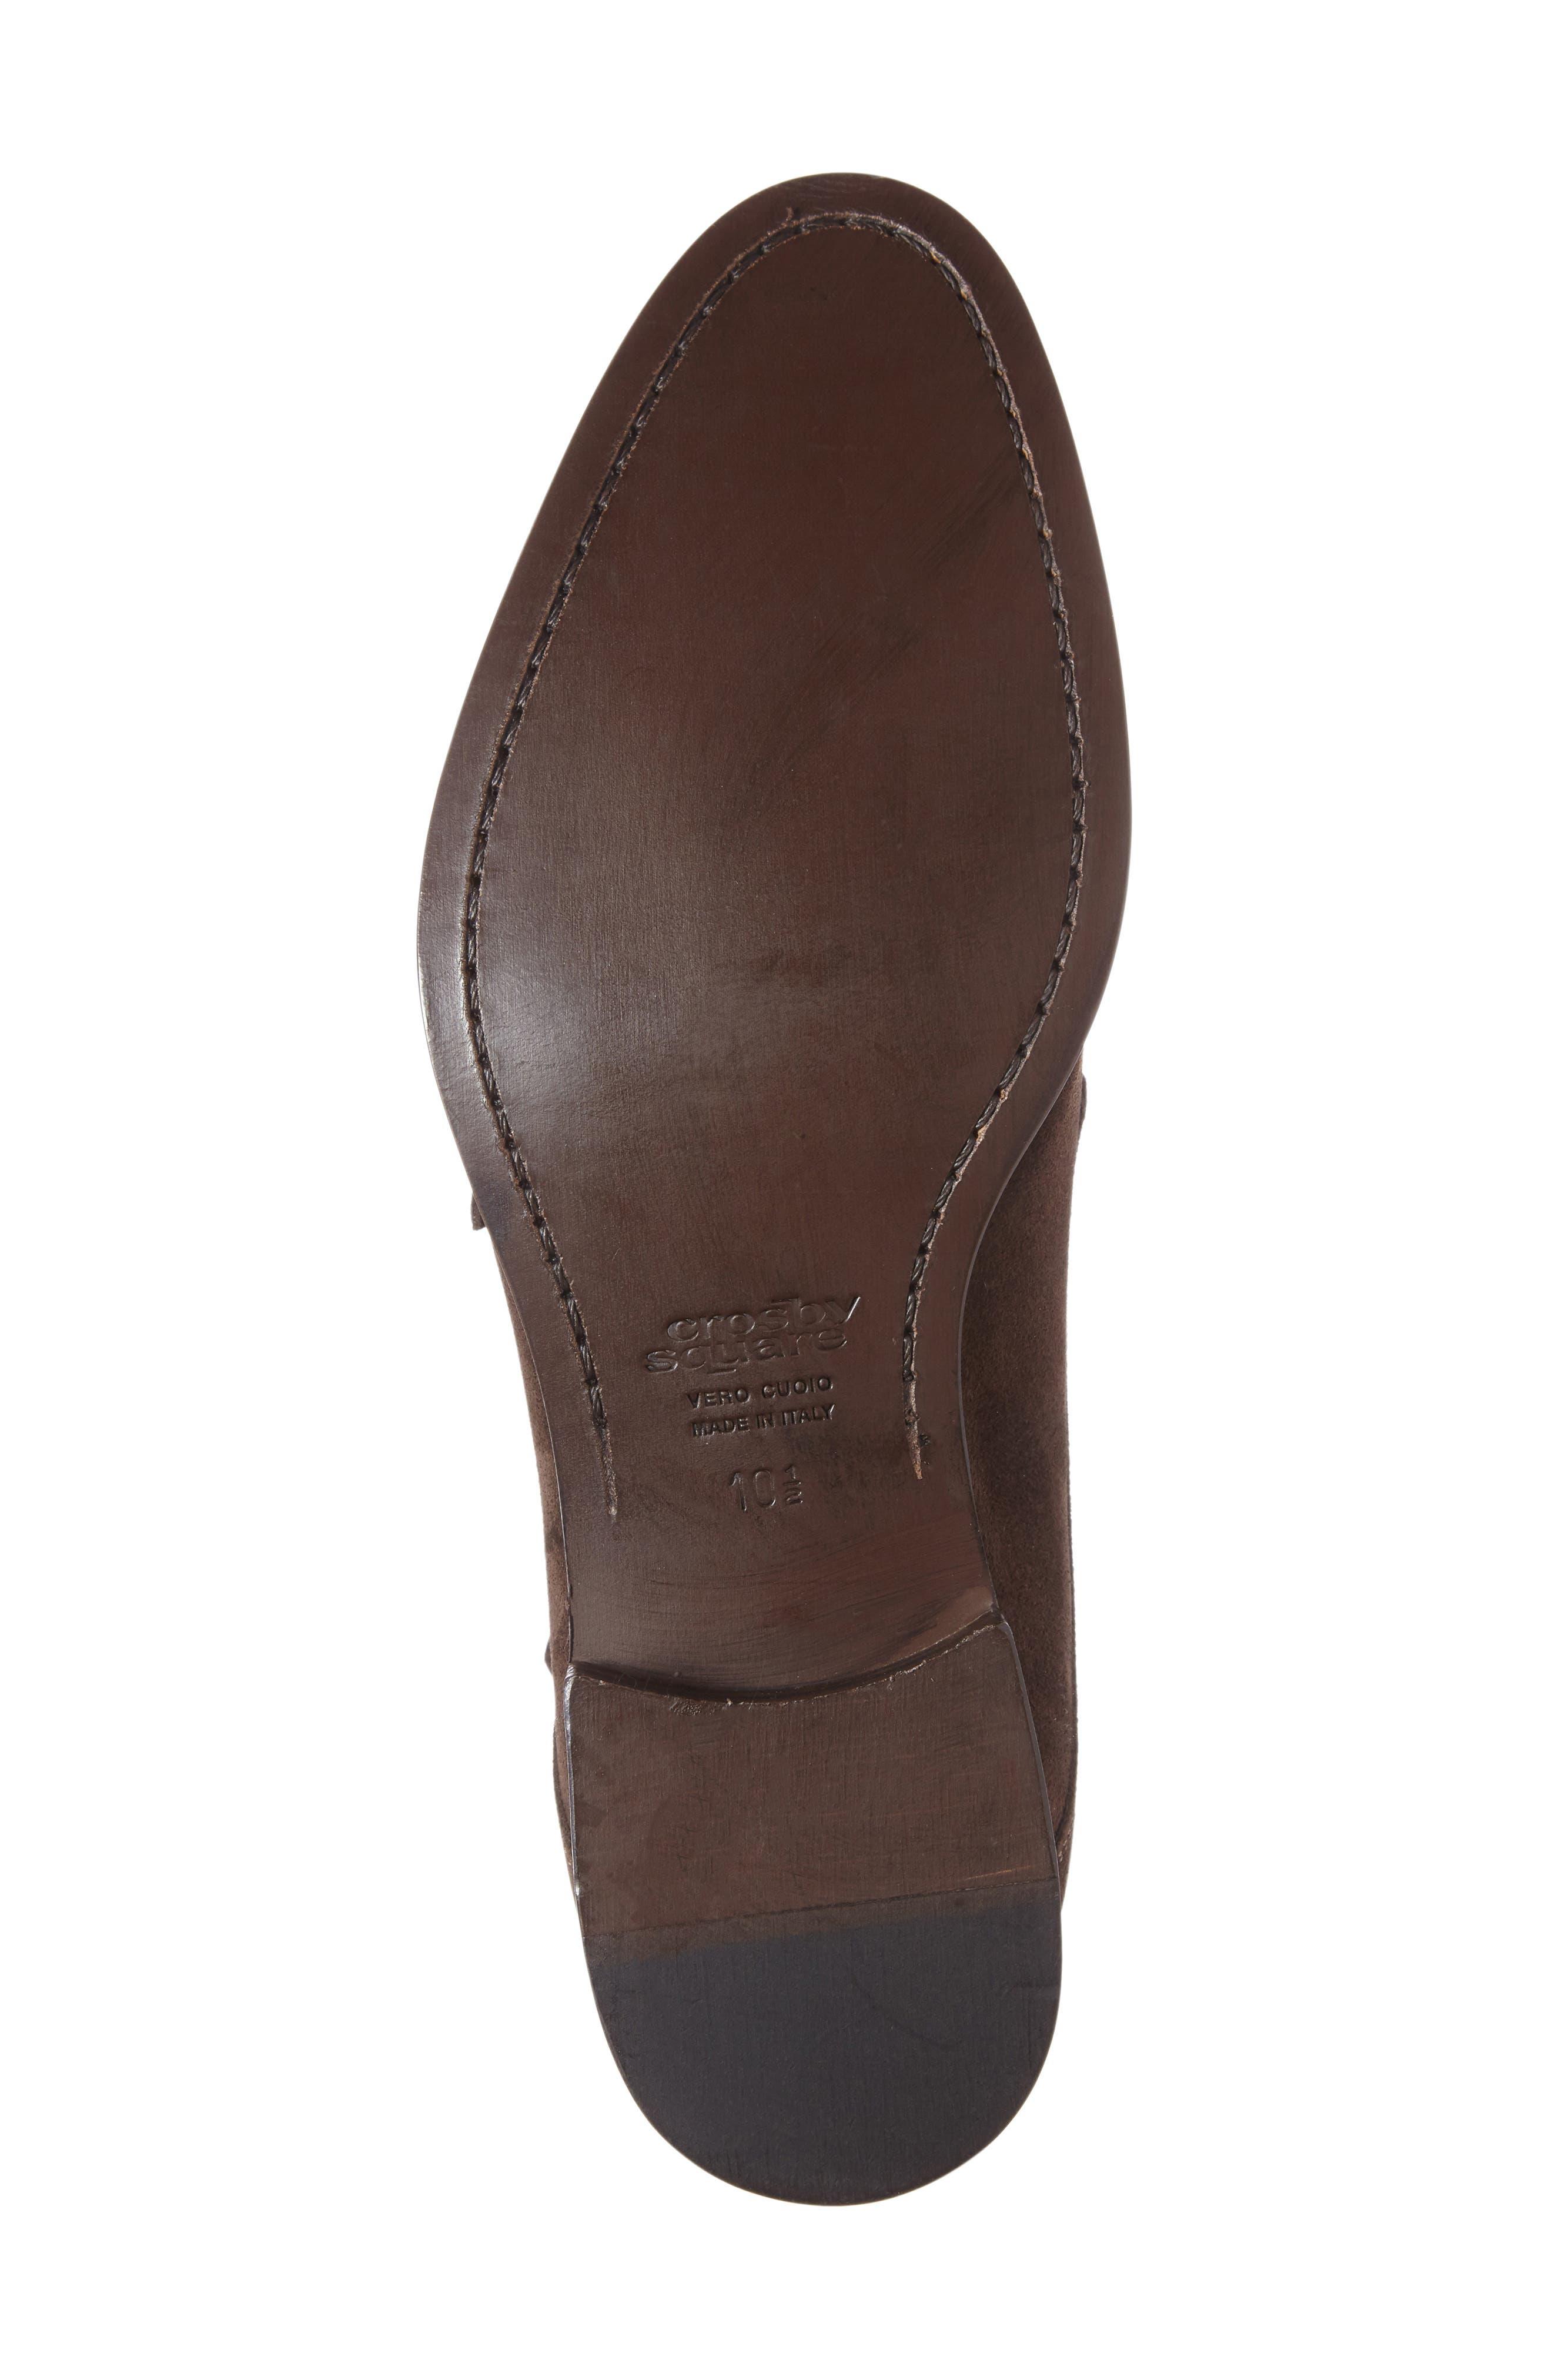 Alternate Image 4  - Crosby Square Conley Double Monk Strap Shoe (Men)